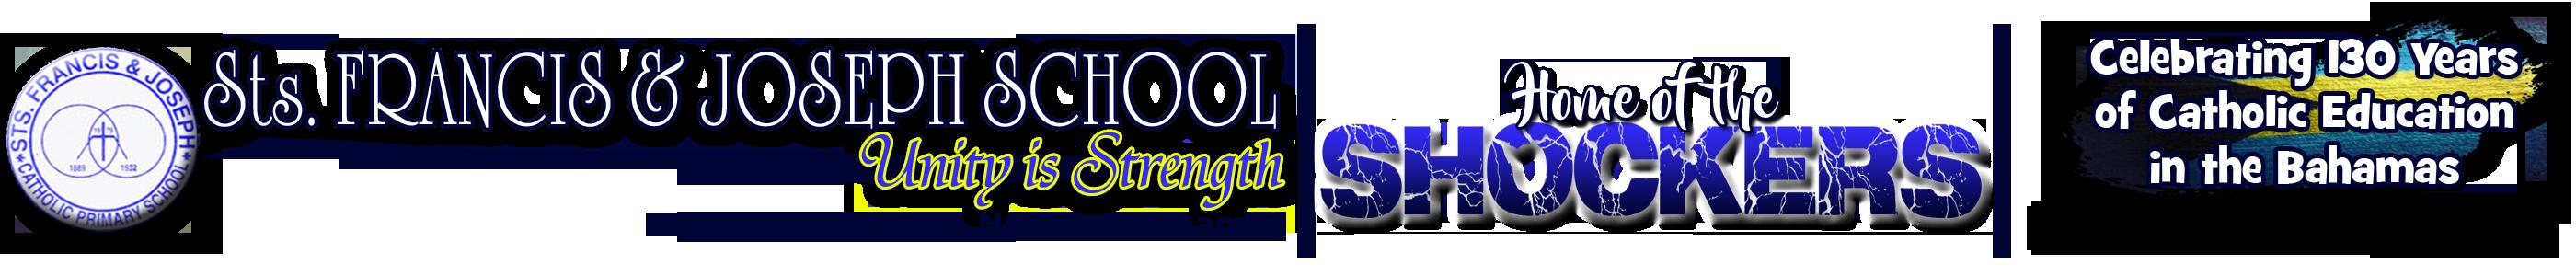 St. Francis and Joseph School Logo